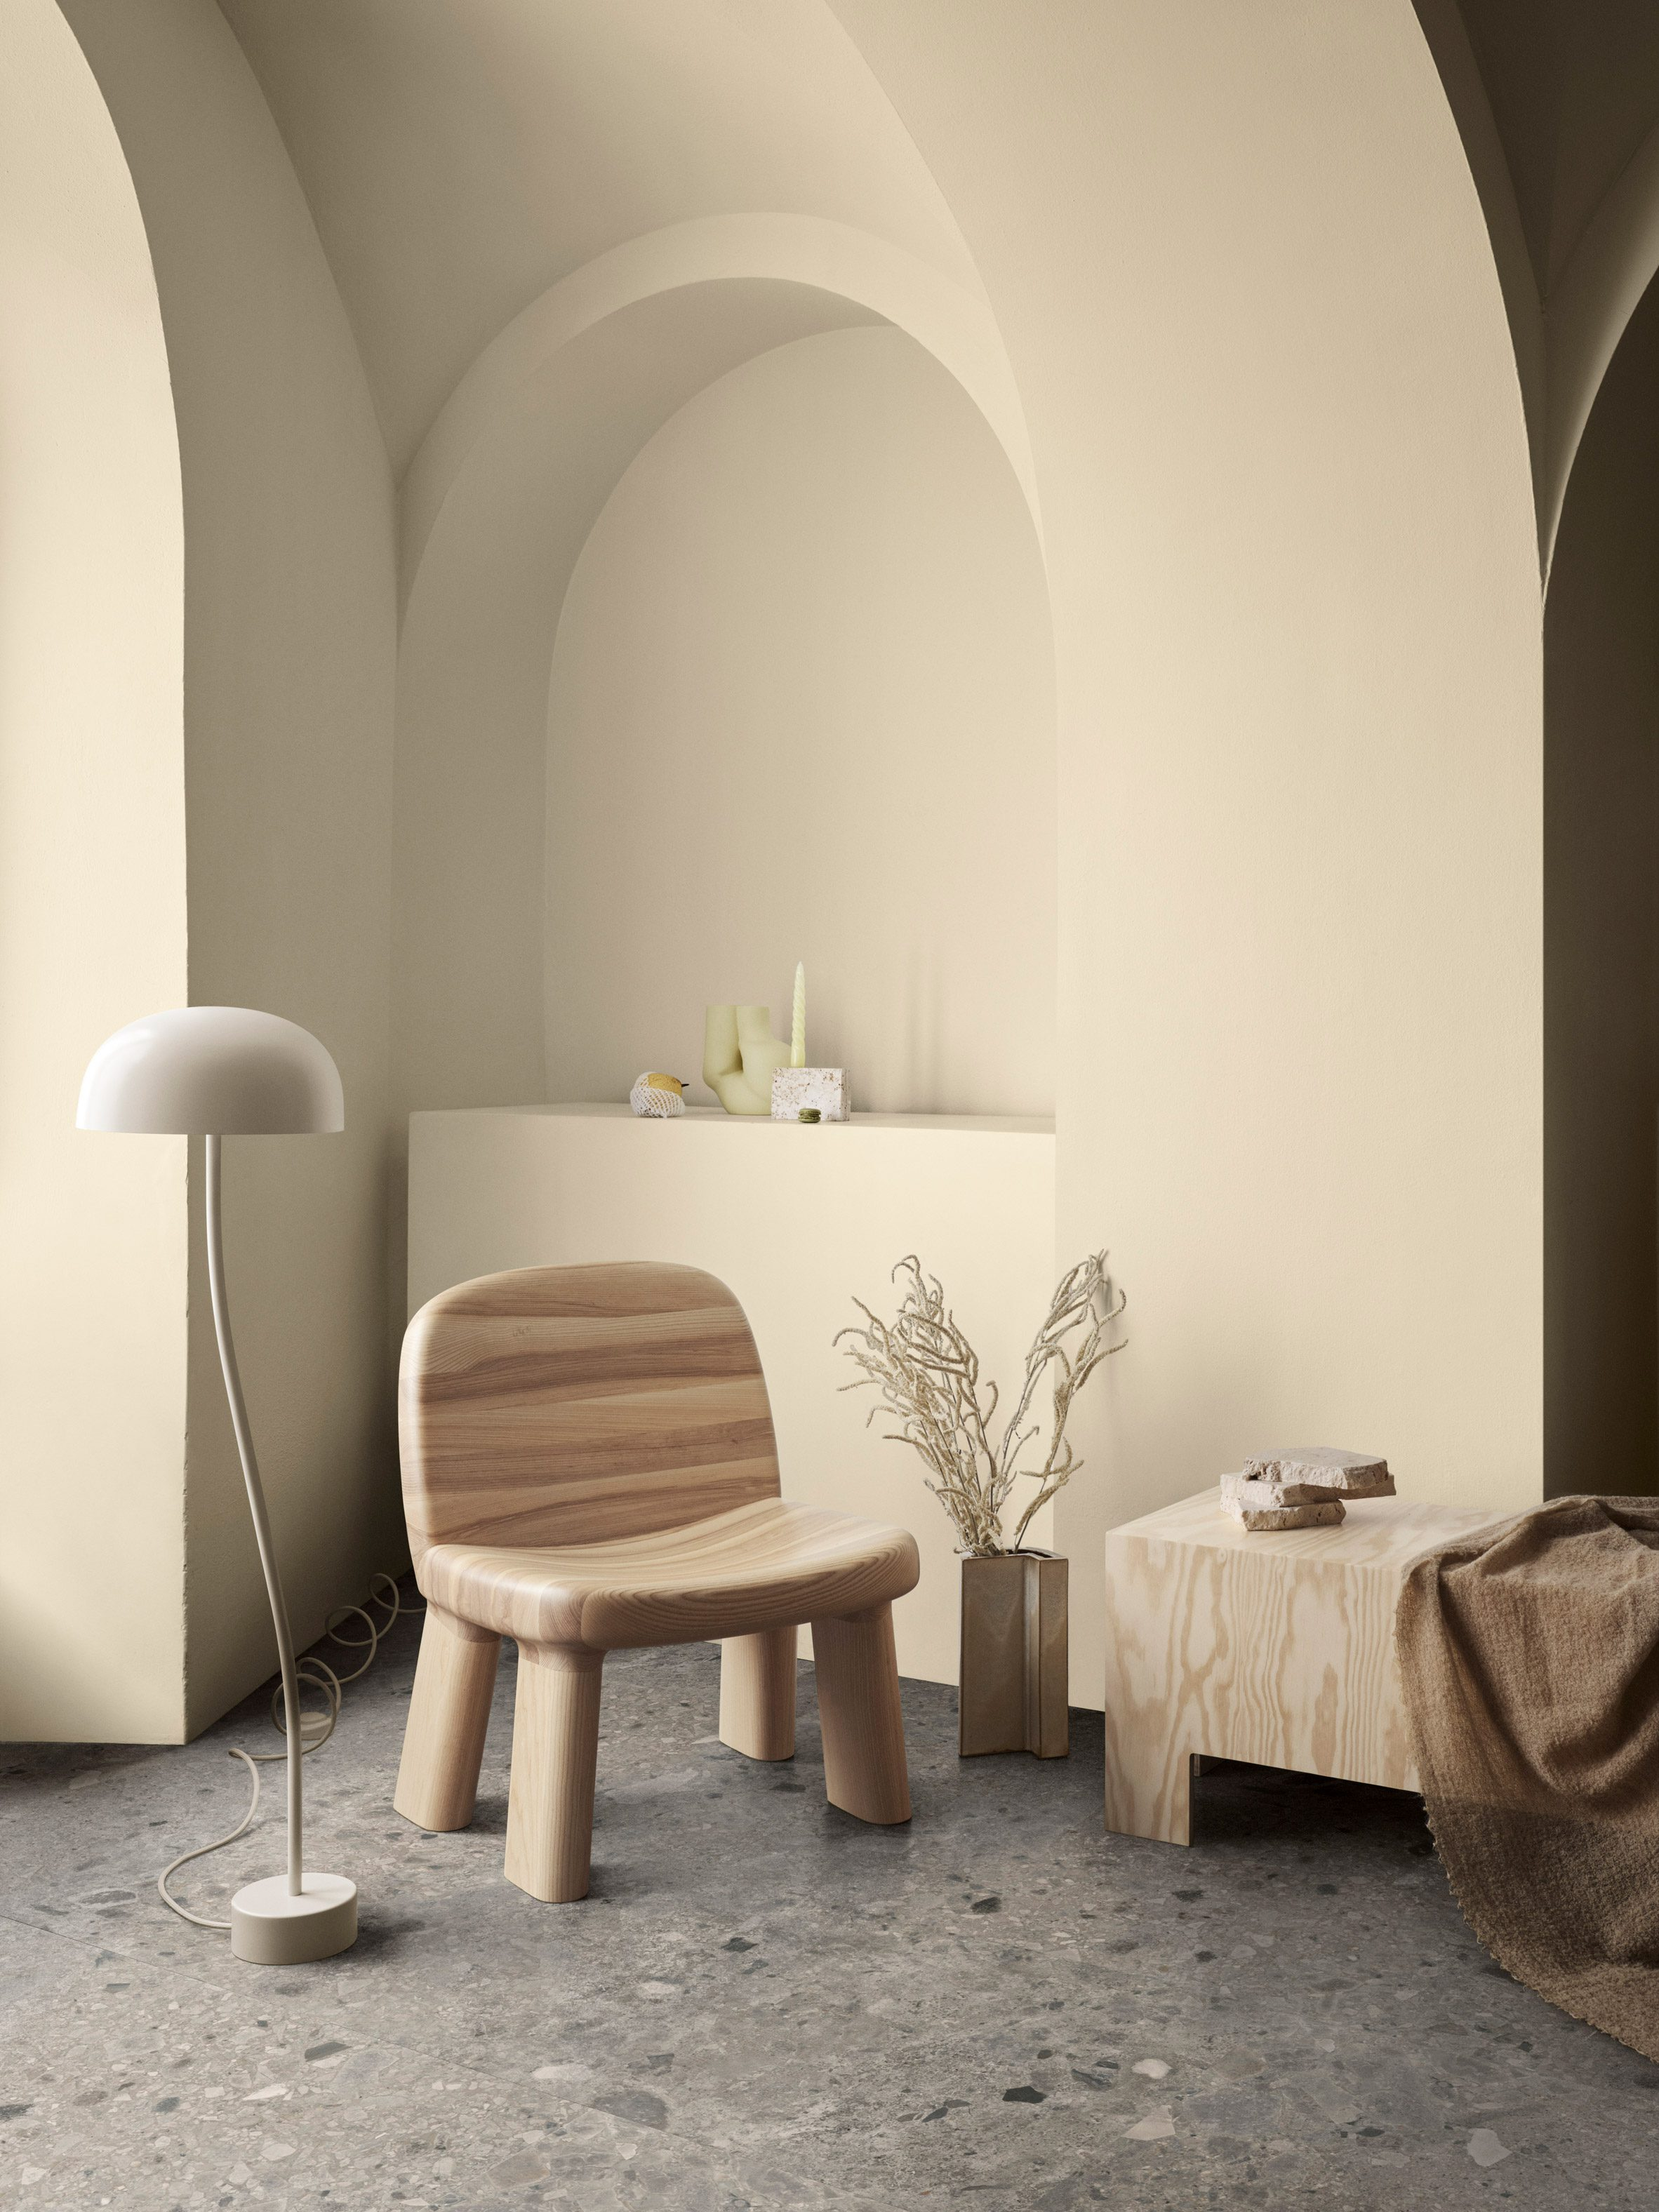 Kursi berlengan Maximus oleh Johan Ansander untuk Stasiun Bla dengan sentuhan kayu alami